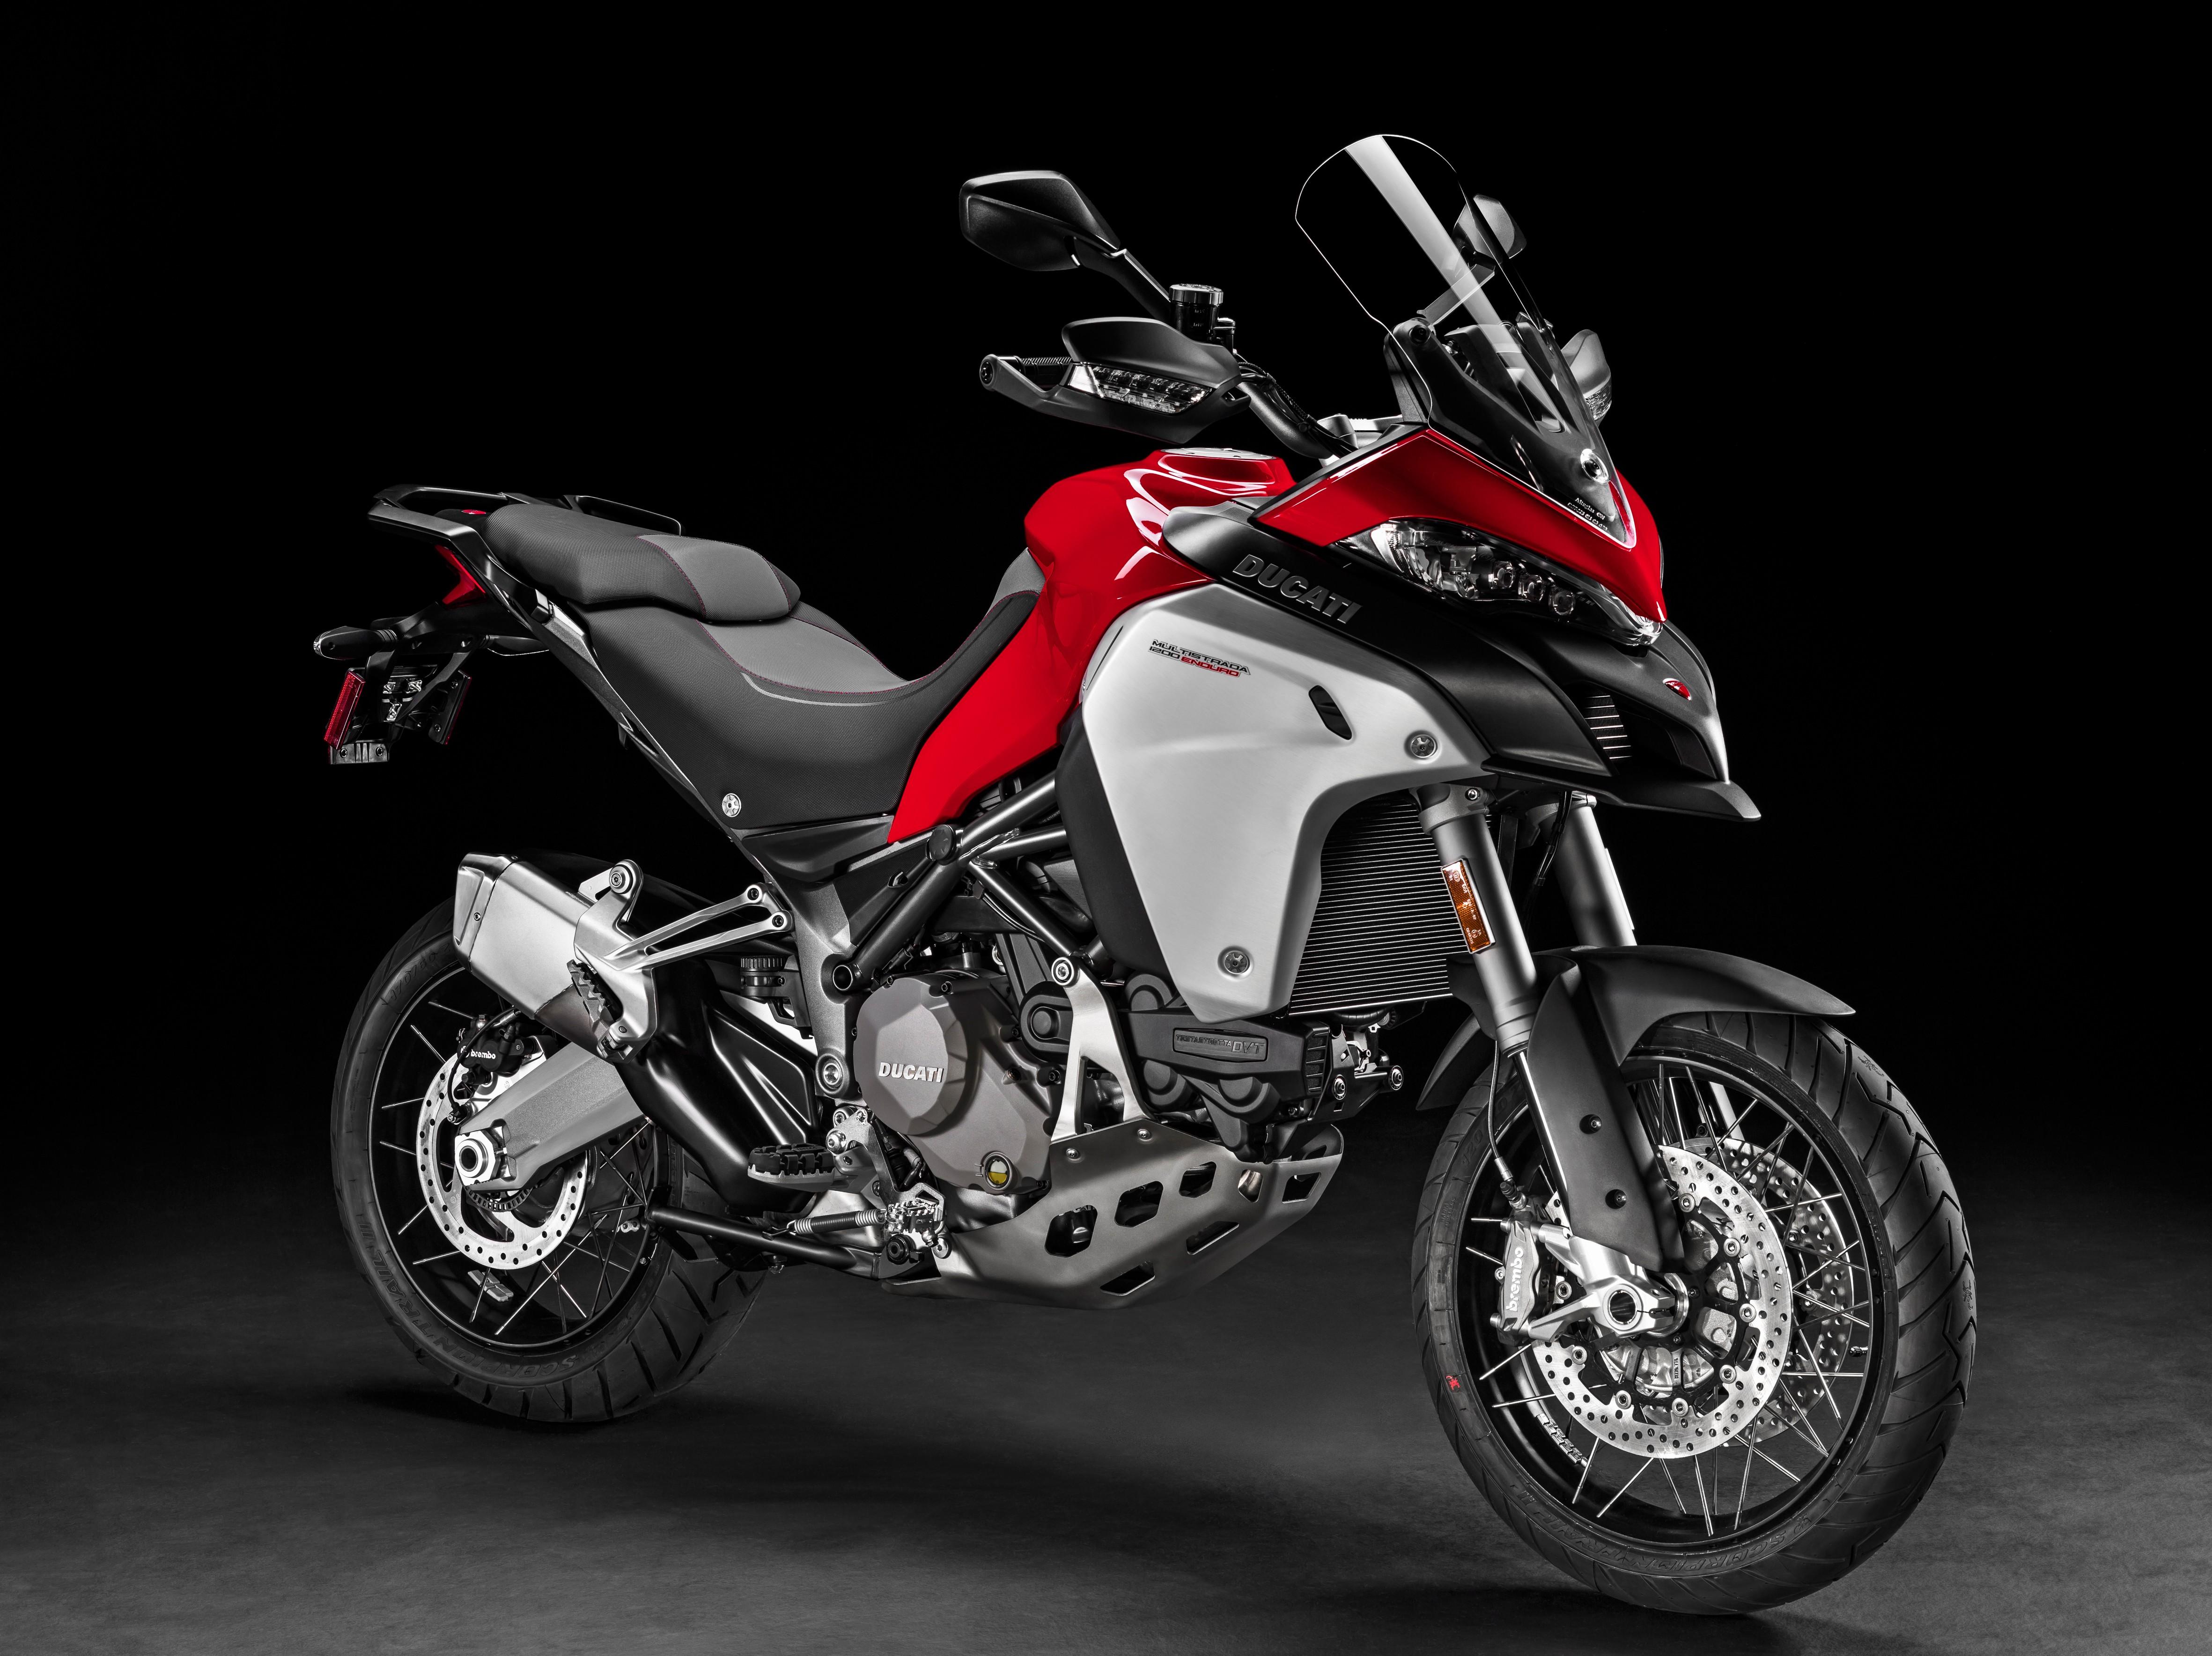 Eicma 2015 Ducati Multistrada 1200 Enduro Eyes New